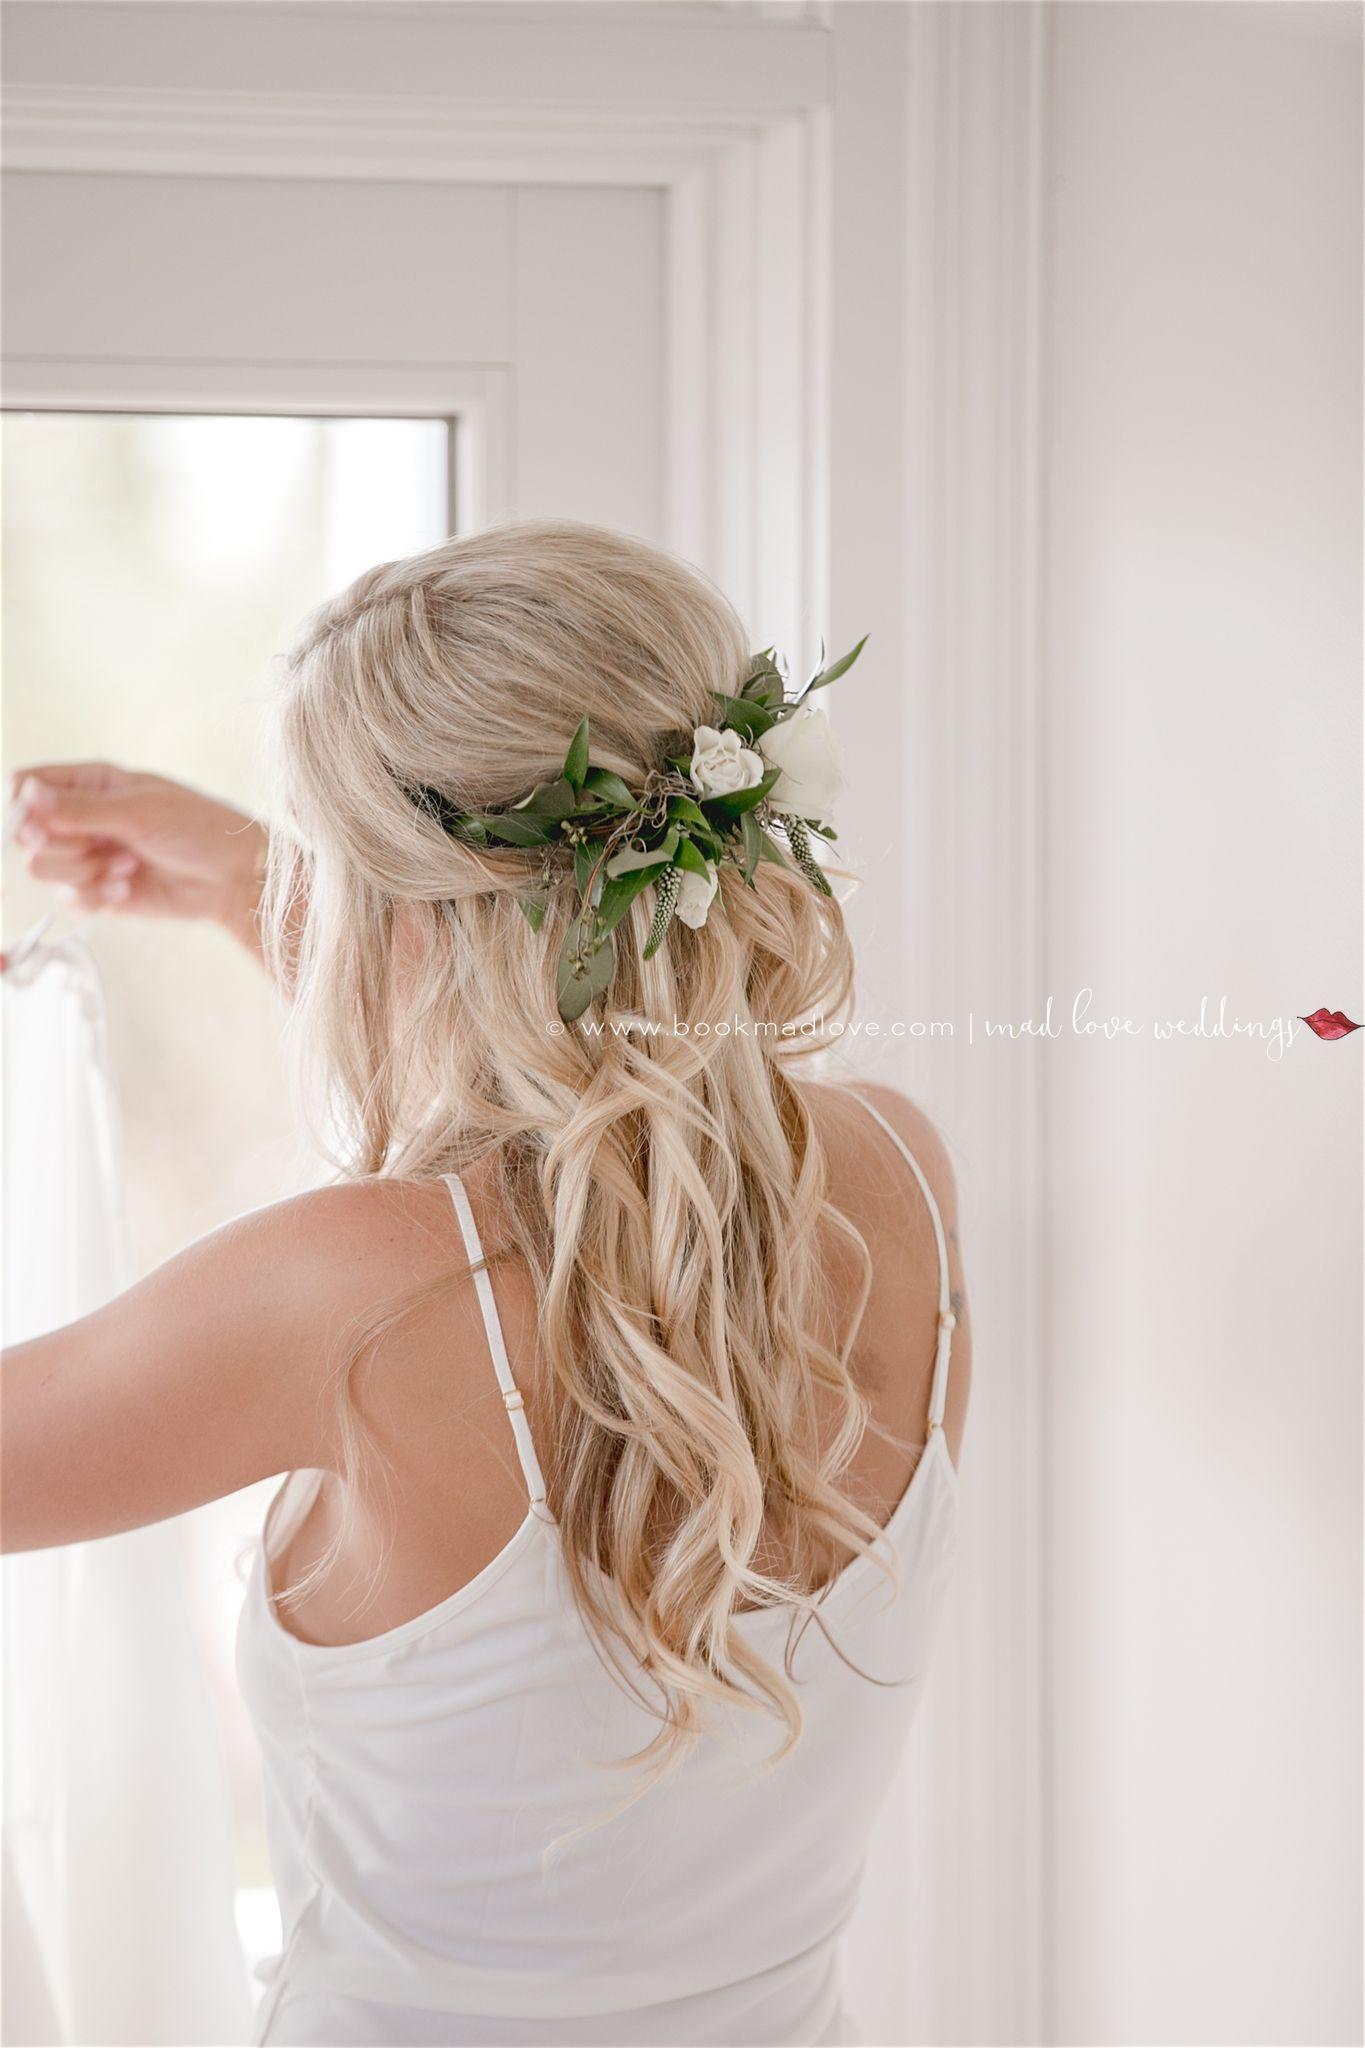 bridal hair and makeup hair greenery piece blonde wavy hair